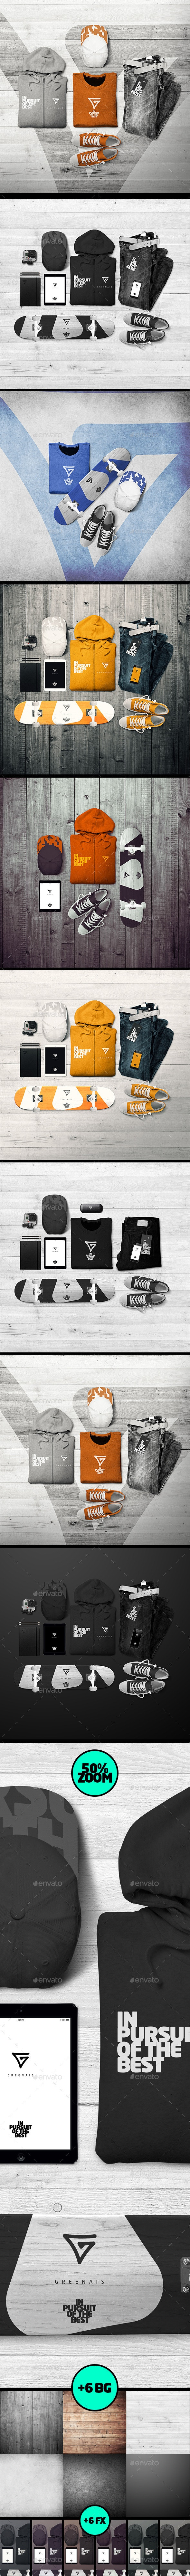 Branding Apparel / Clothing mock-up - T-shirts Apparel